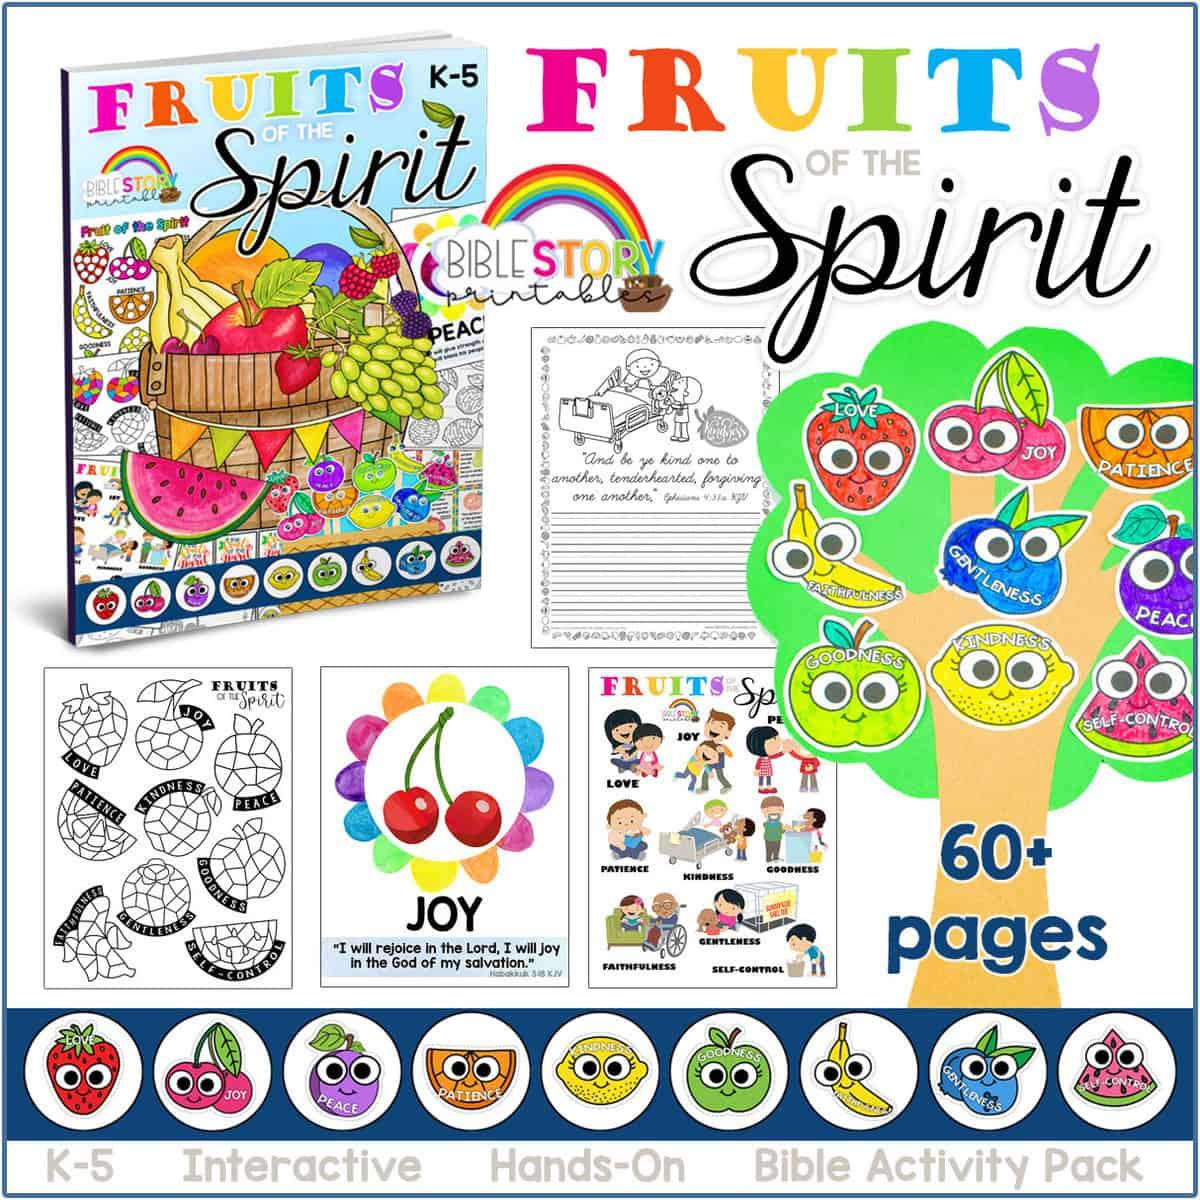 Fruitofthespiritworksheets